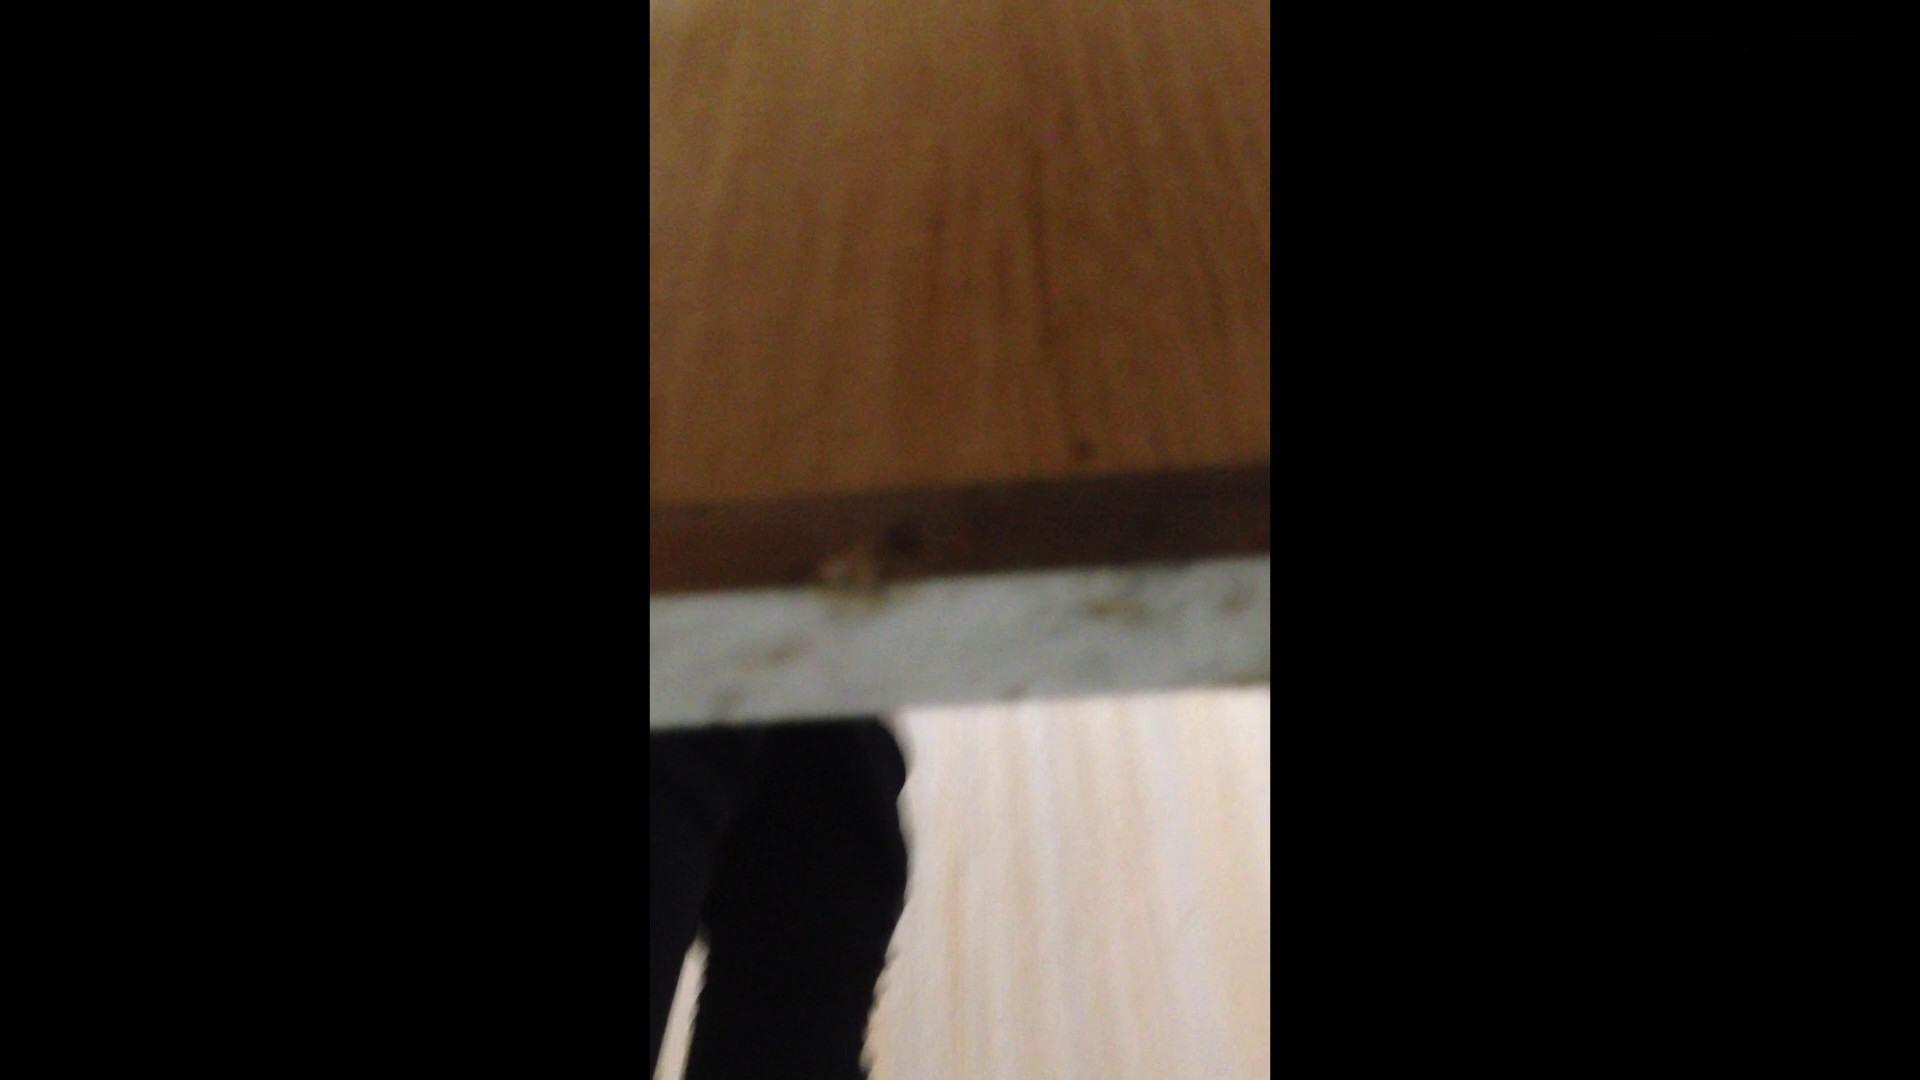 芸術大学ガチ潜入盗撮 JD盗撮 美女の洗面所の秘密 Vol.87 美女 戯れ無修正画像 79枚 57